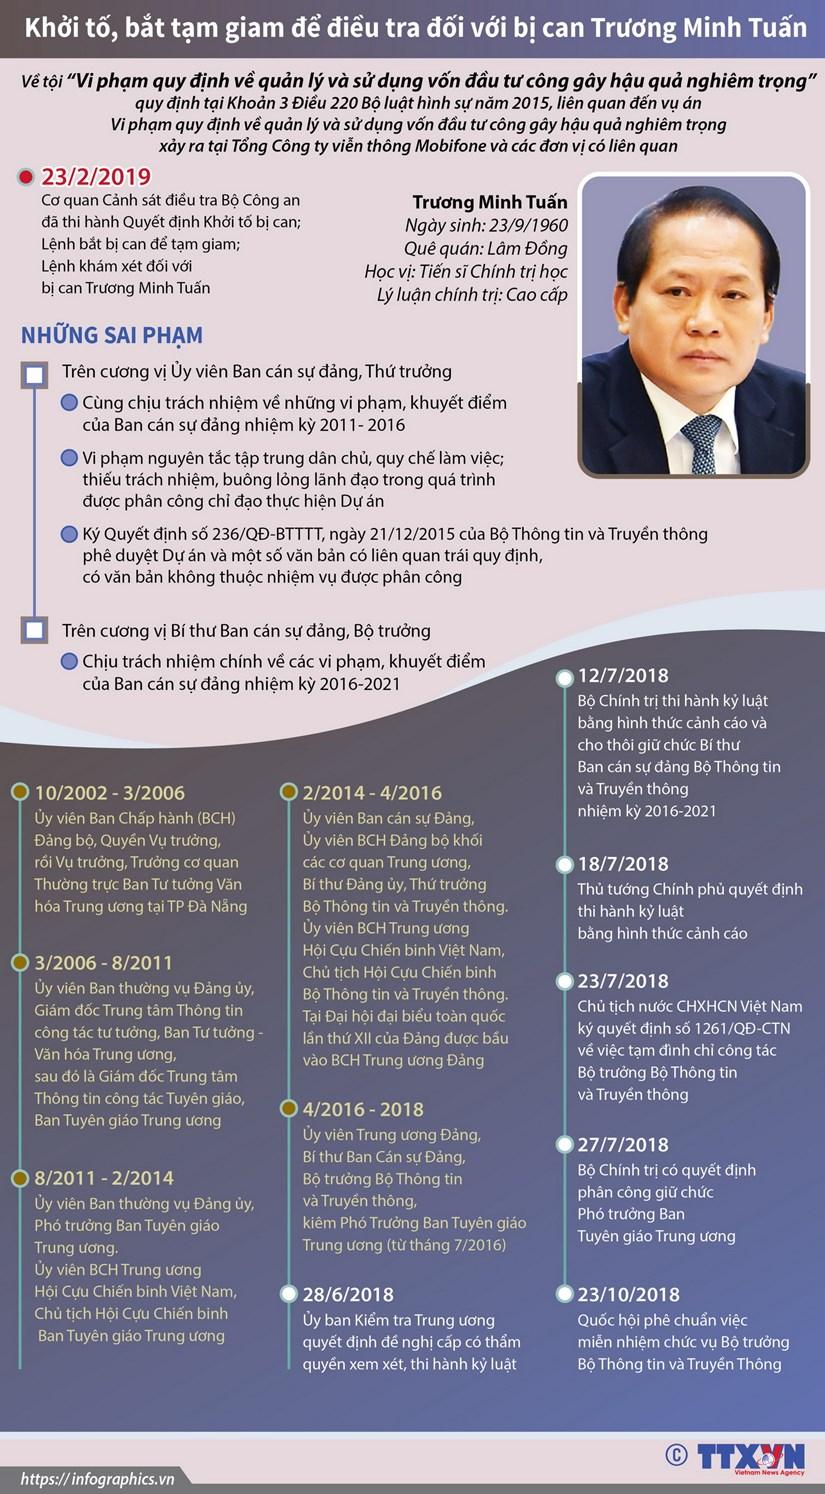 [Infographics] Khoi to, bat tam giam doi voi bi can Truong Minh Tuan hinh anh 1